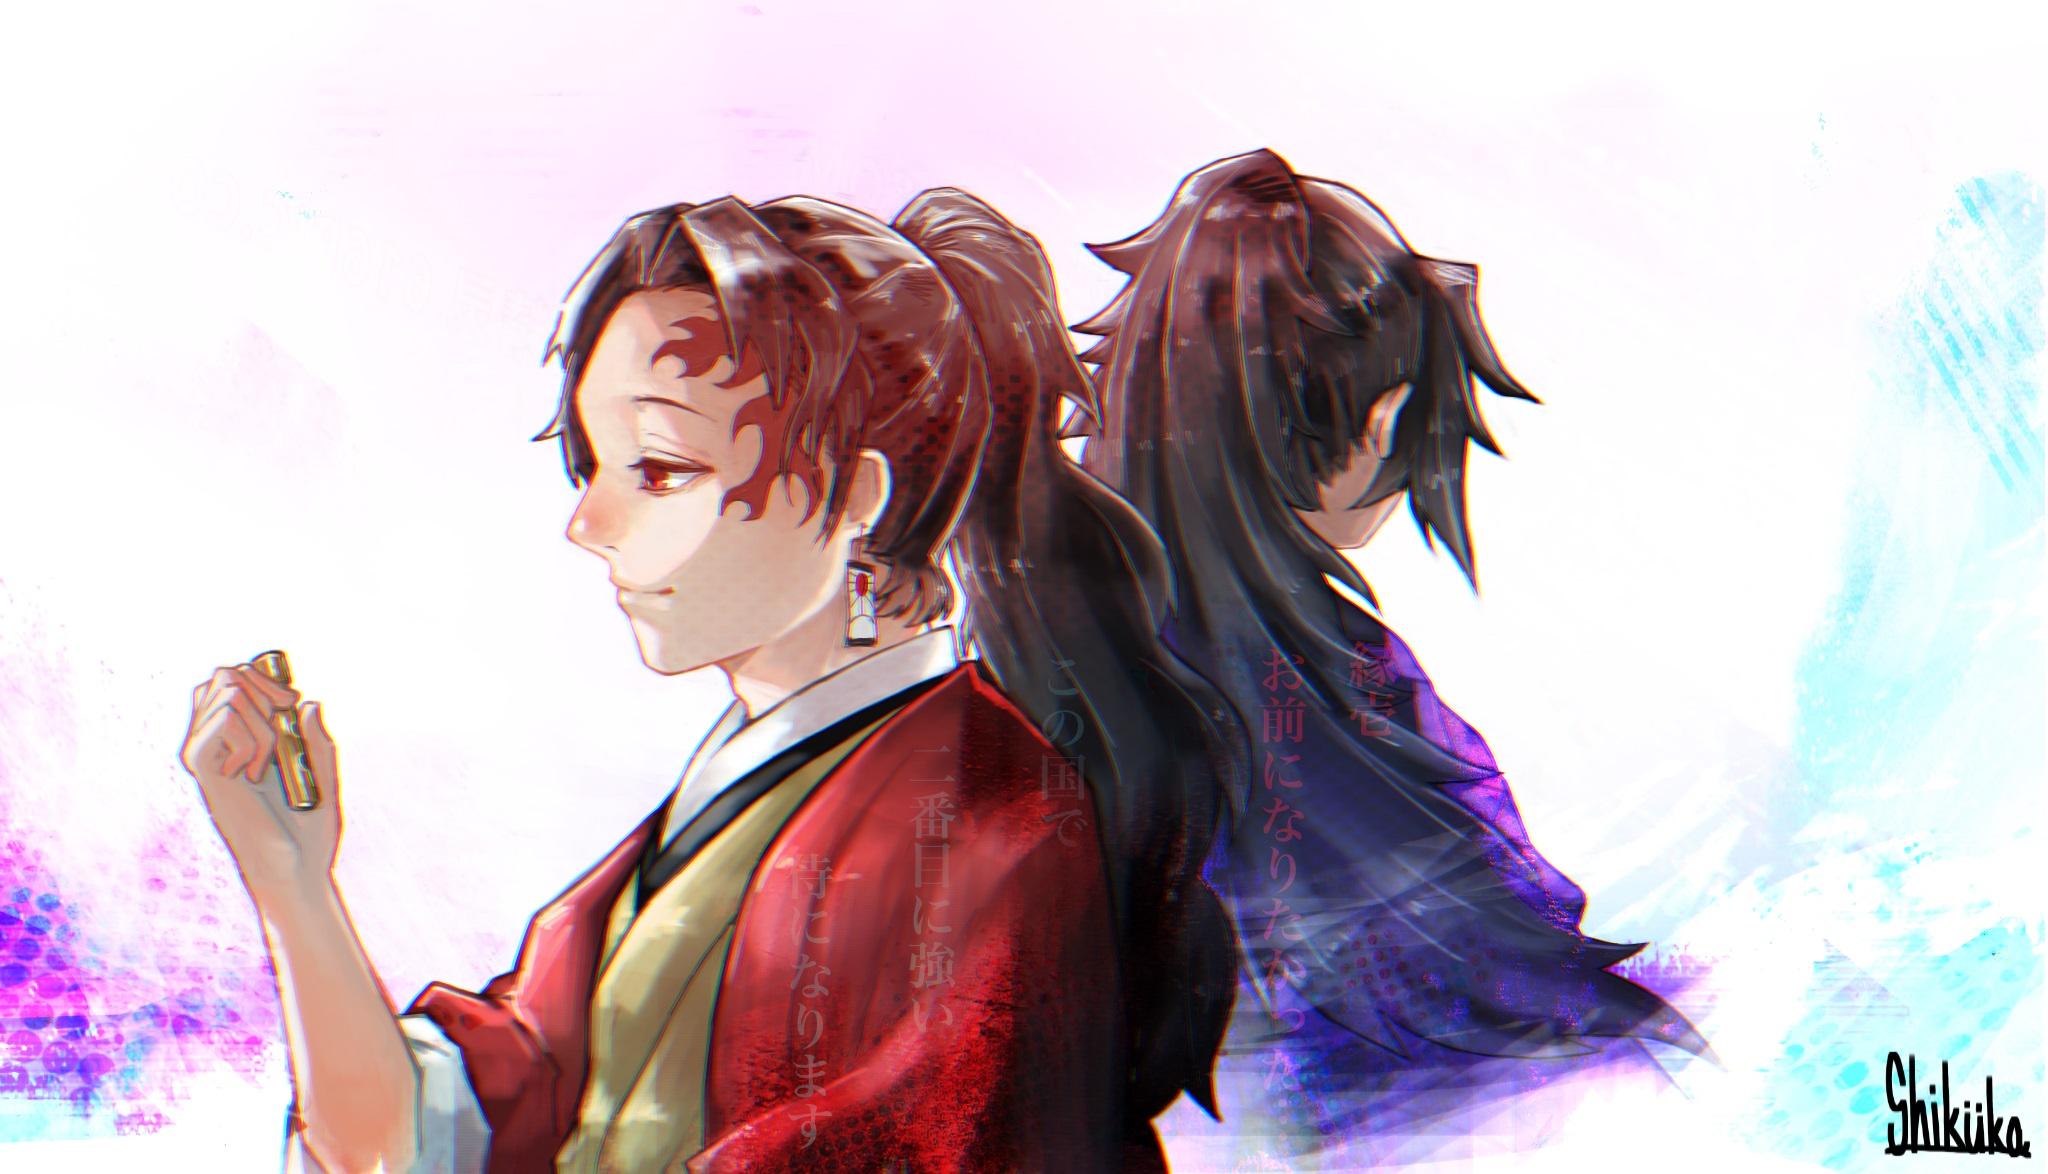 Demon Slayer: Kimetsu no Yaiba HD Wallpaper | Background Image | 2048x1174 | ID:1045335 ...